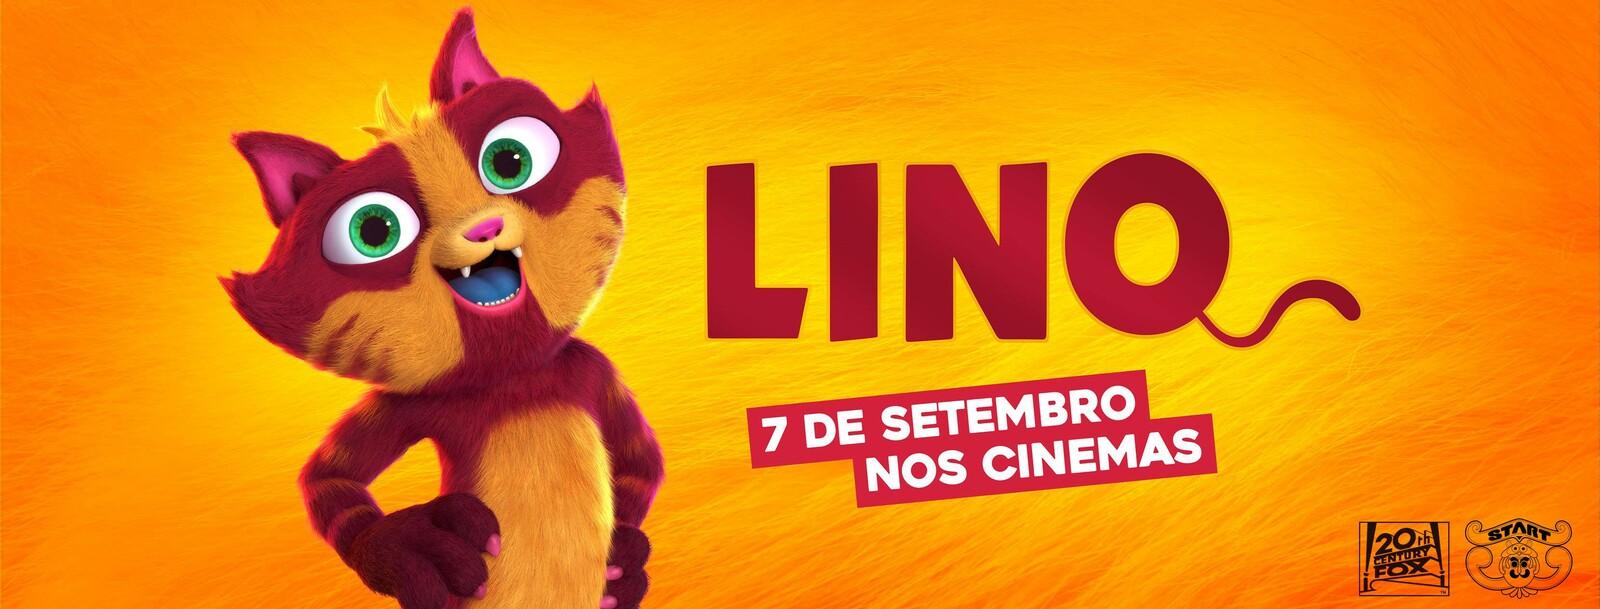 Brazilian movie banner